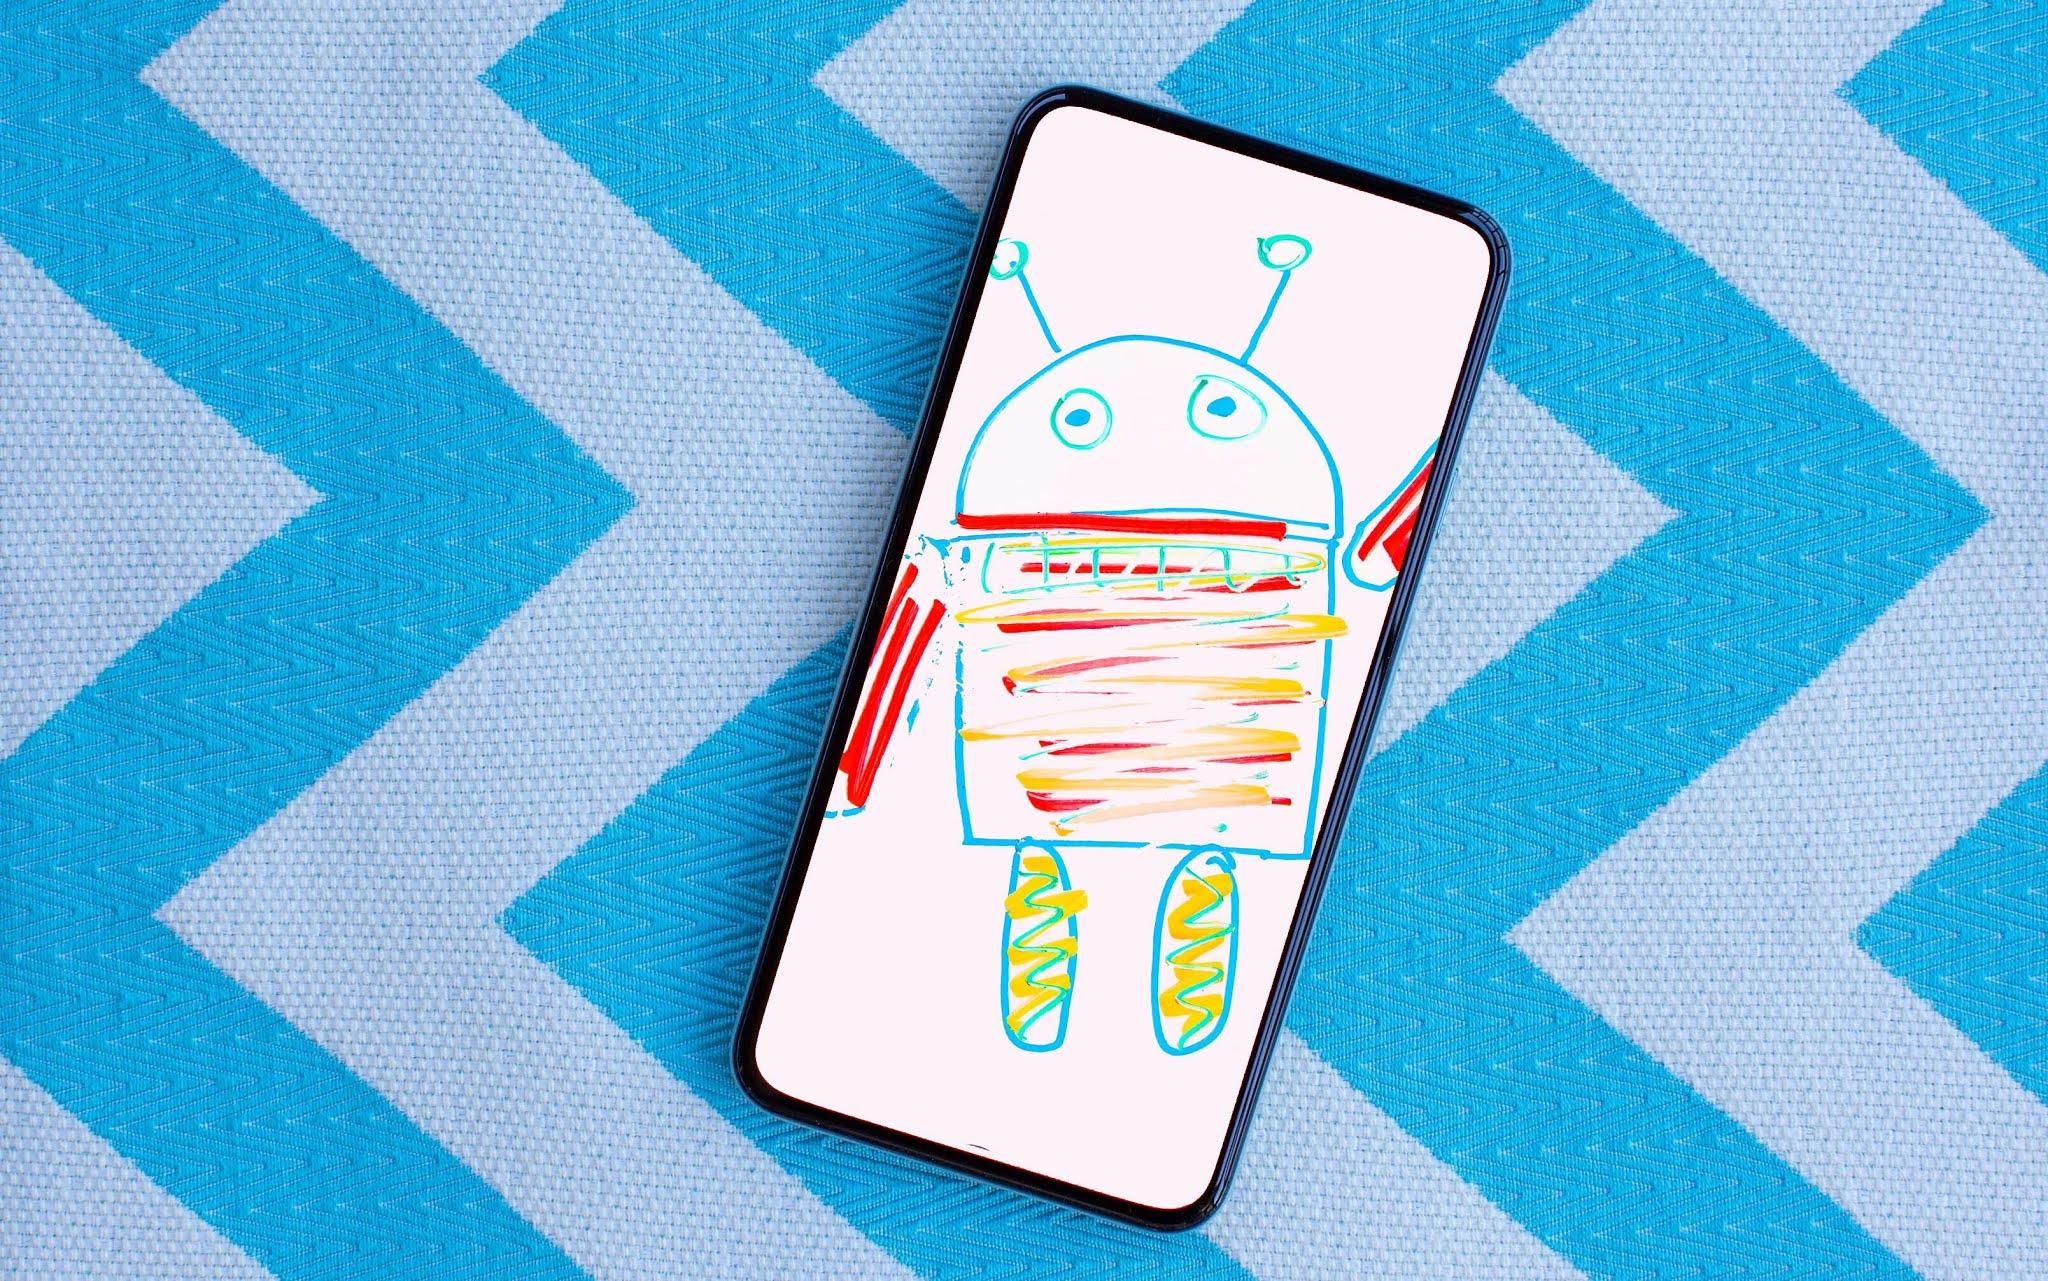 Android 12: أخبار نظام التشغيل ، كيفية تثبيت الإصدار ...من Google الآن